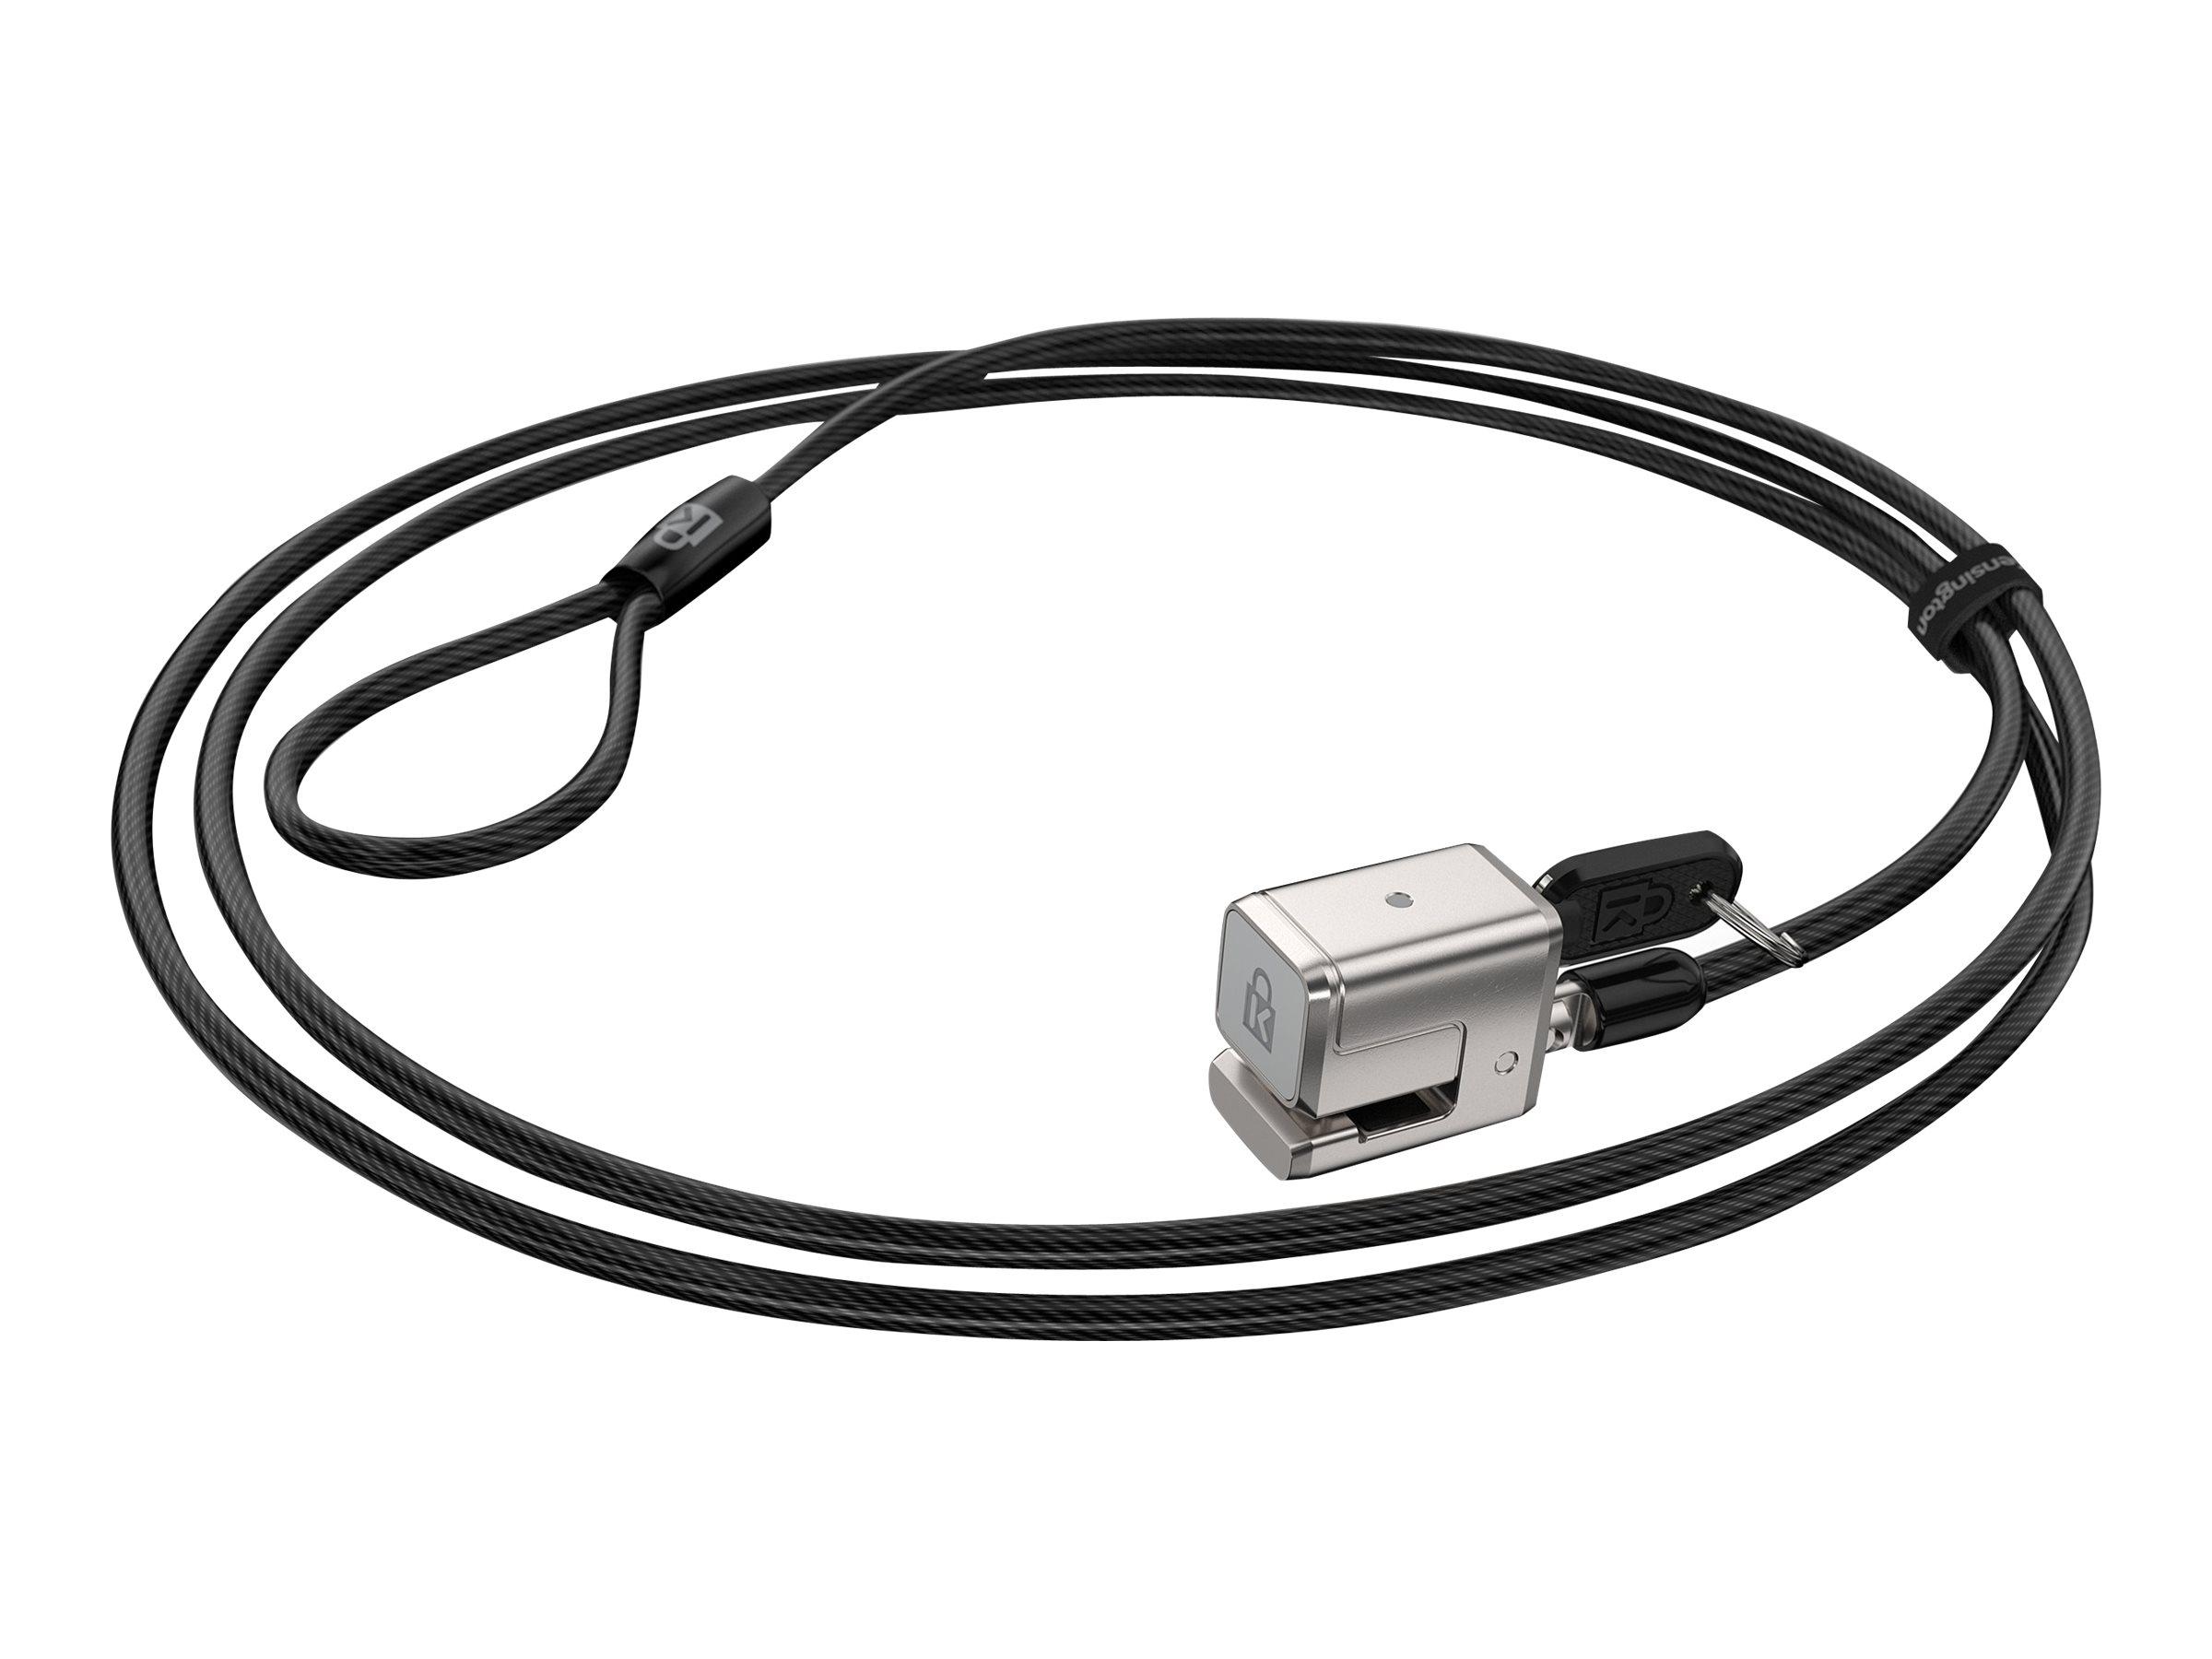 Kensington Keyed Cable Lock for Surface Pro - Supervisor Keyed - Sicherheitskabelschloss - für Microsoft Surface Go, Go 2, Pro (